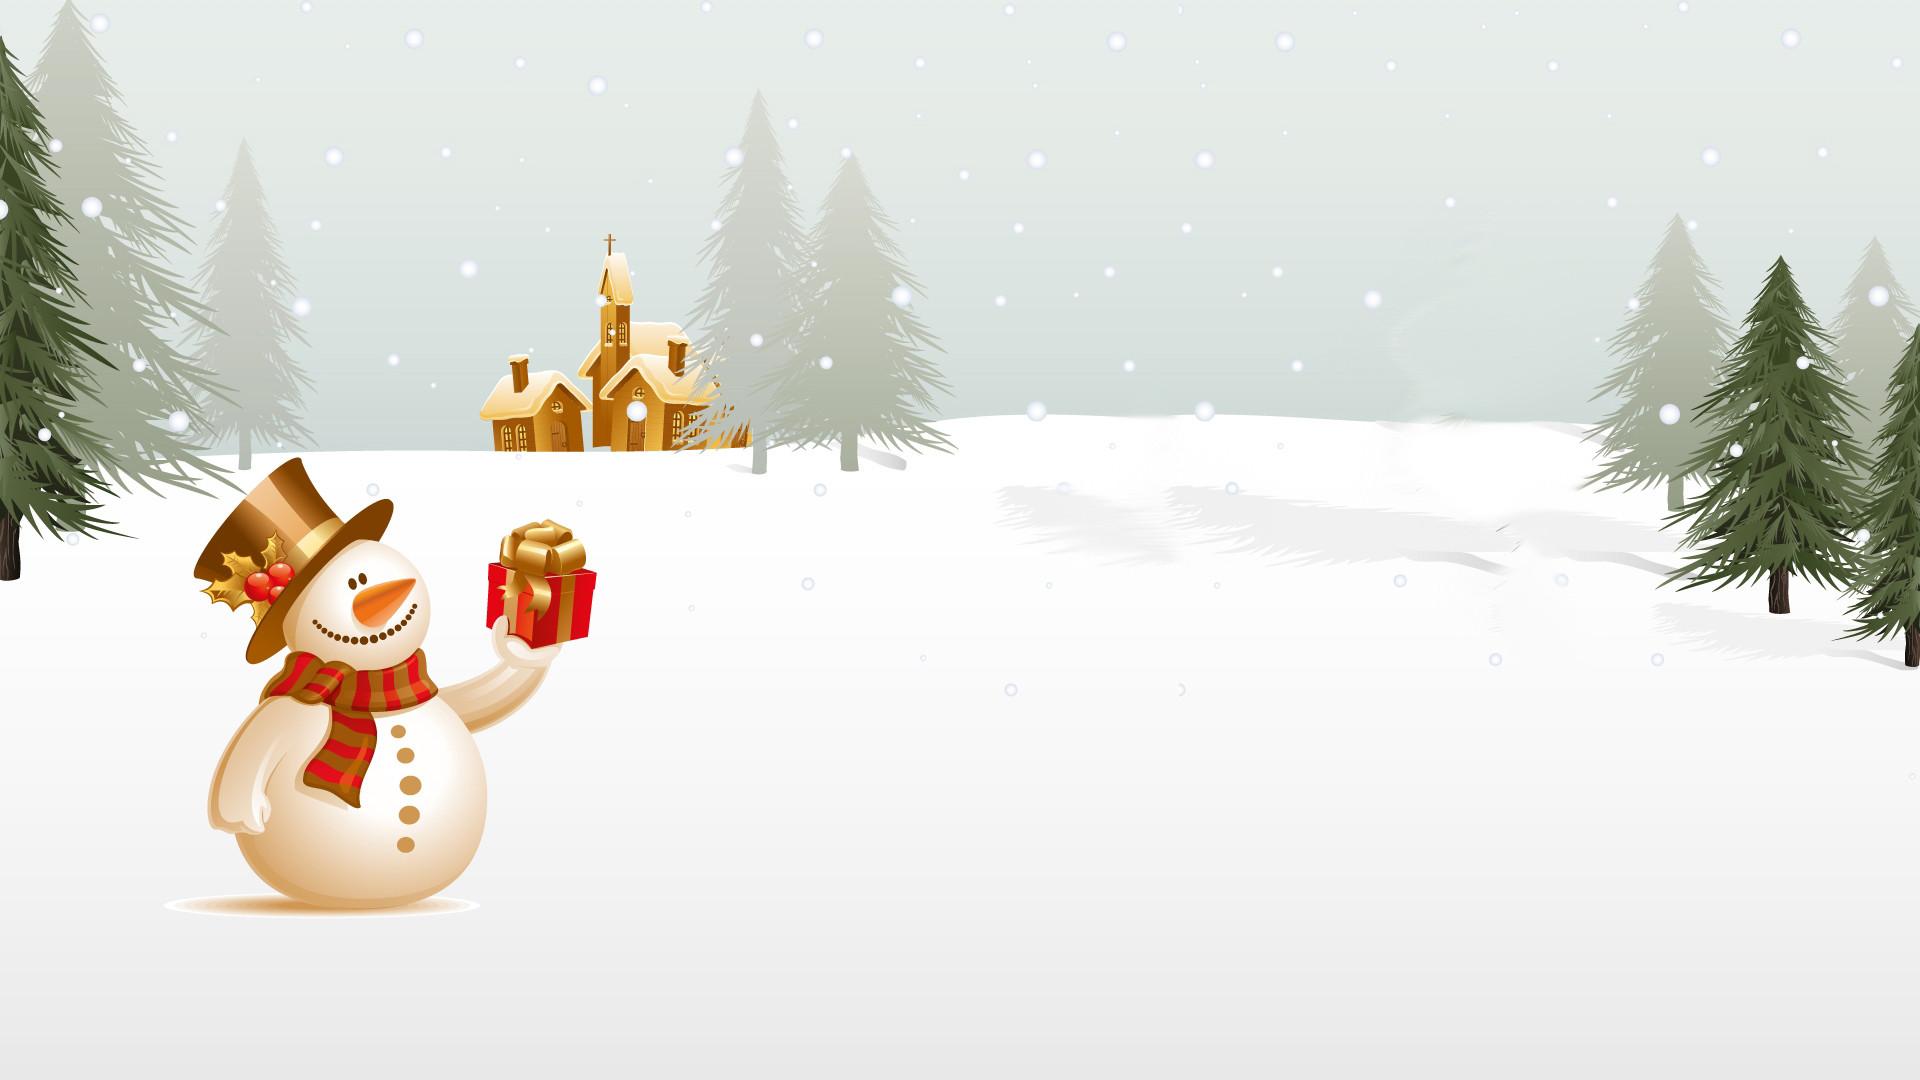 christmas-snowman-beautiful-image-hd-desktop-wallpapers-by-